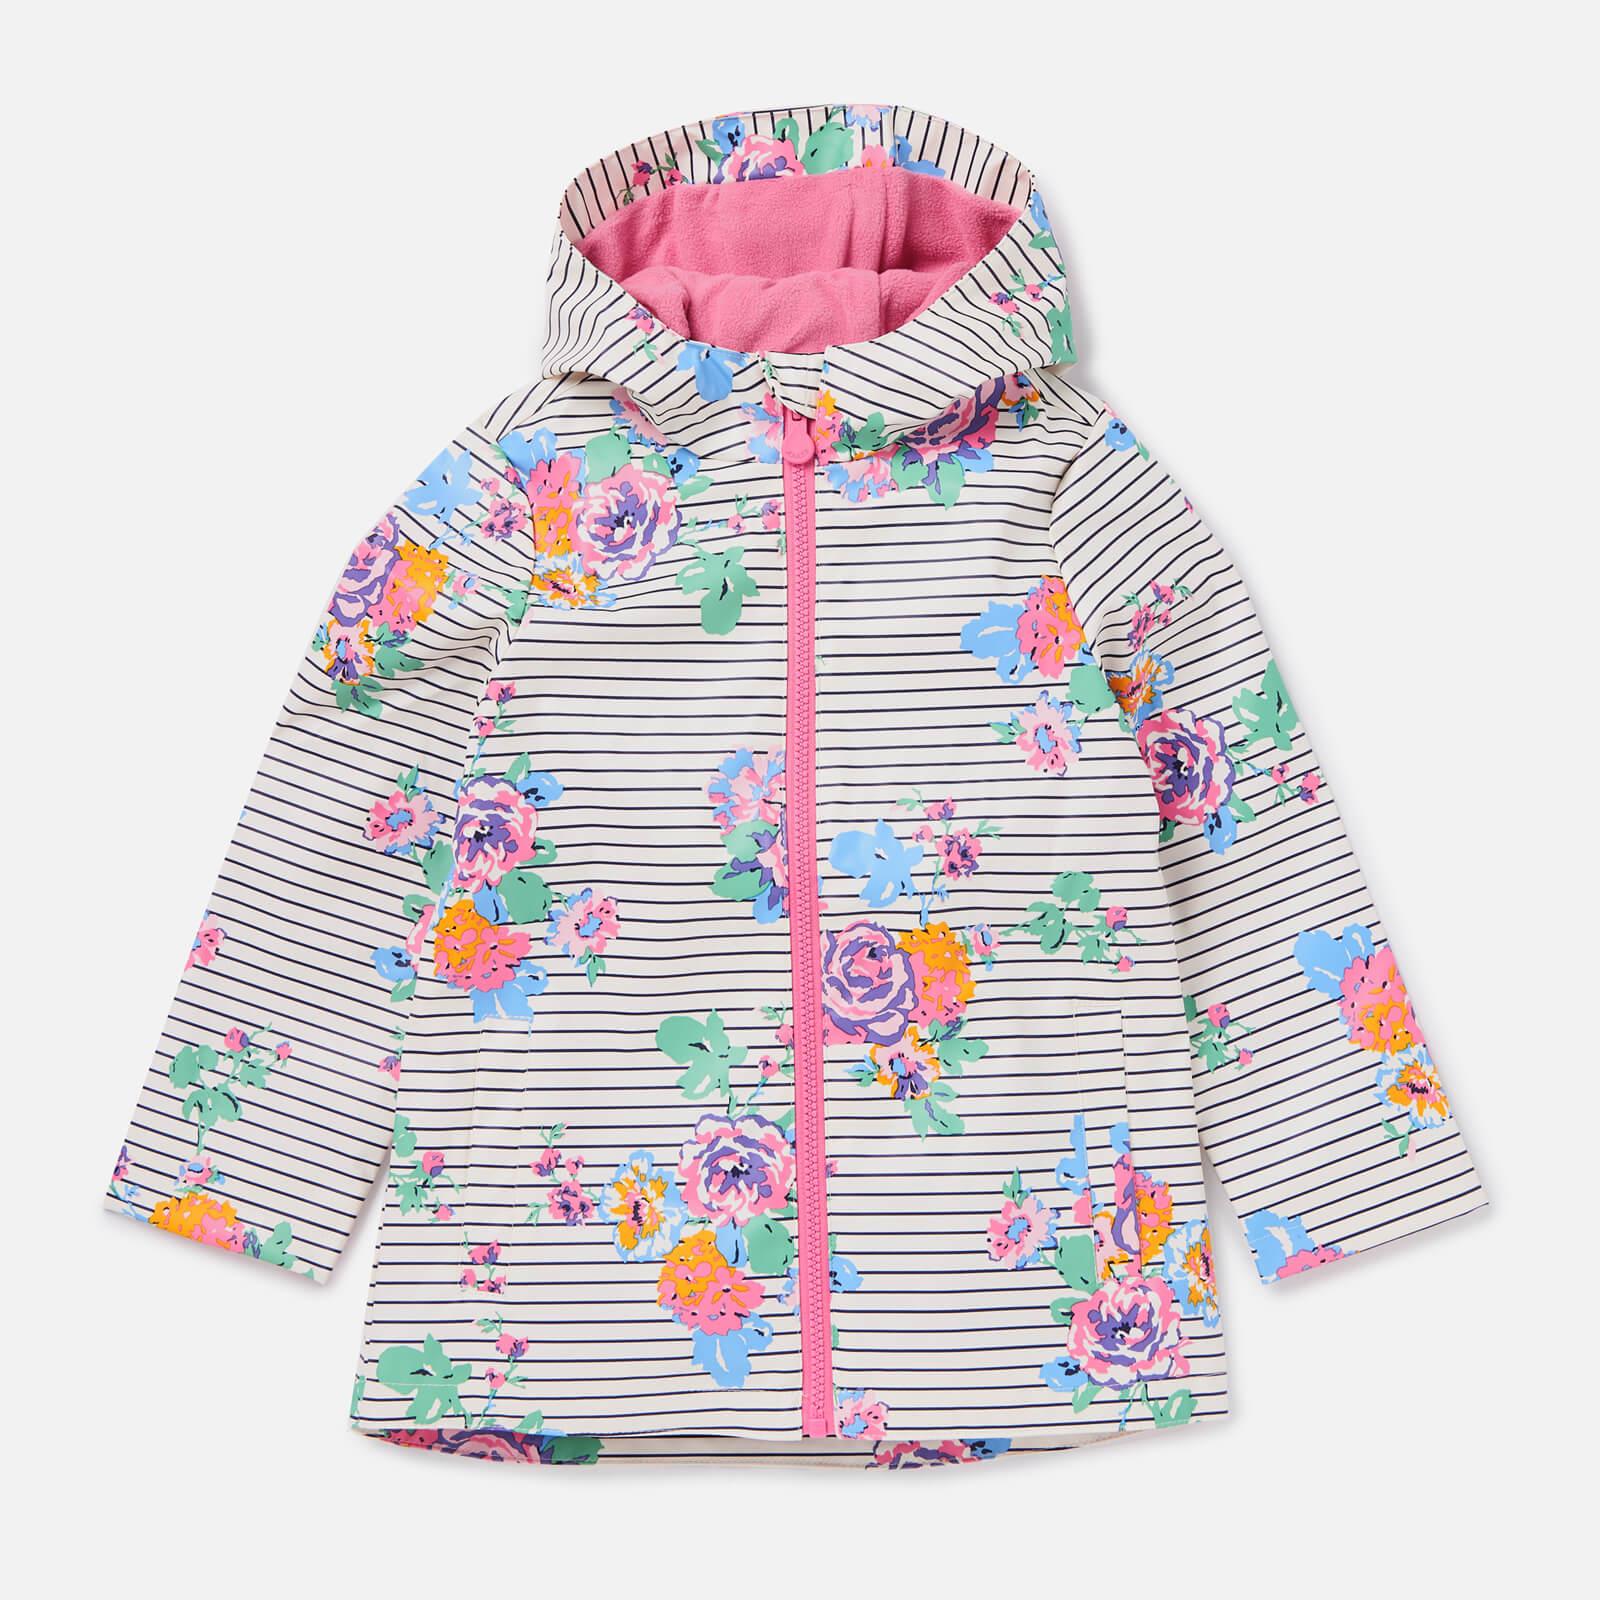 Joules Girls' Raindance Showerproof Rubber Coat - Cream Navy Floral - 6 Years